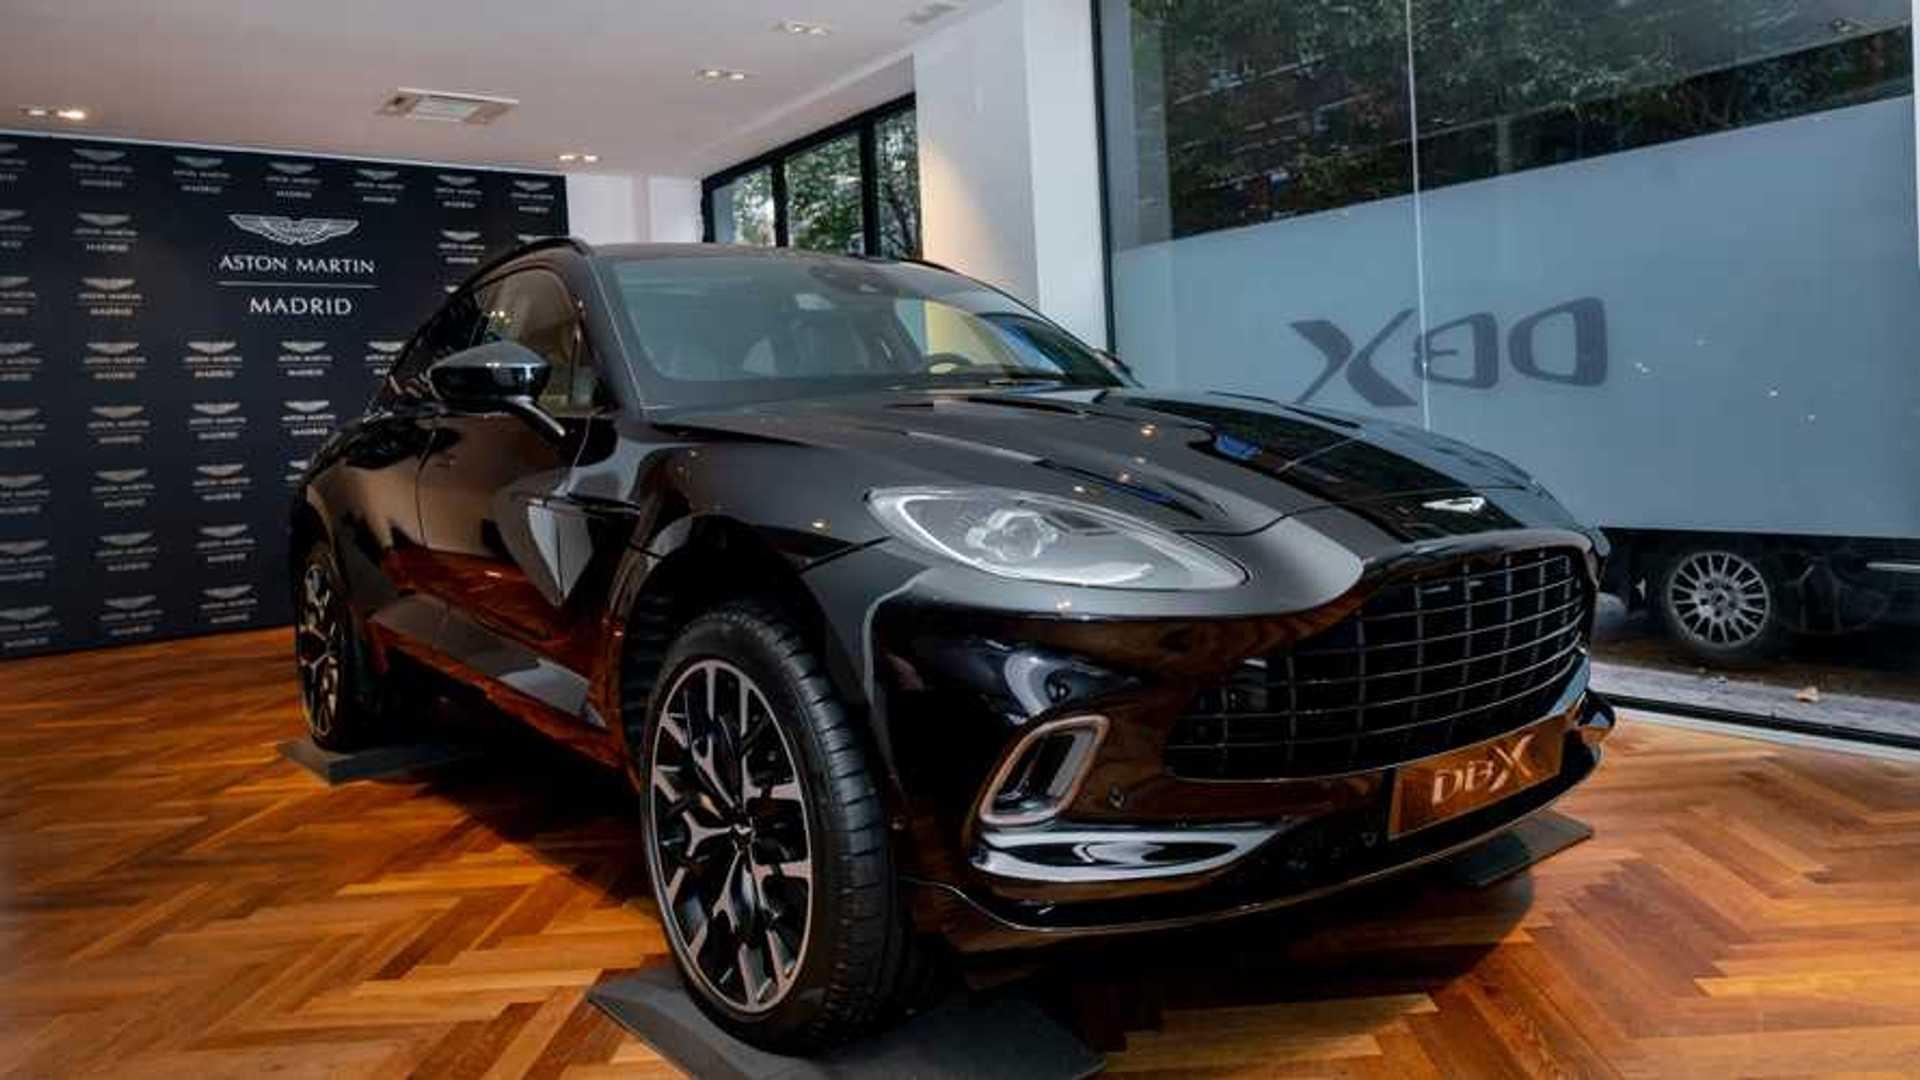 2019 - [Aston Martin] DBX - Page 7 Aston-martin-dbx-presentacion-en-madrid